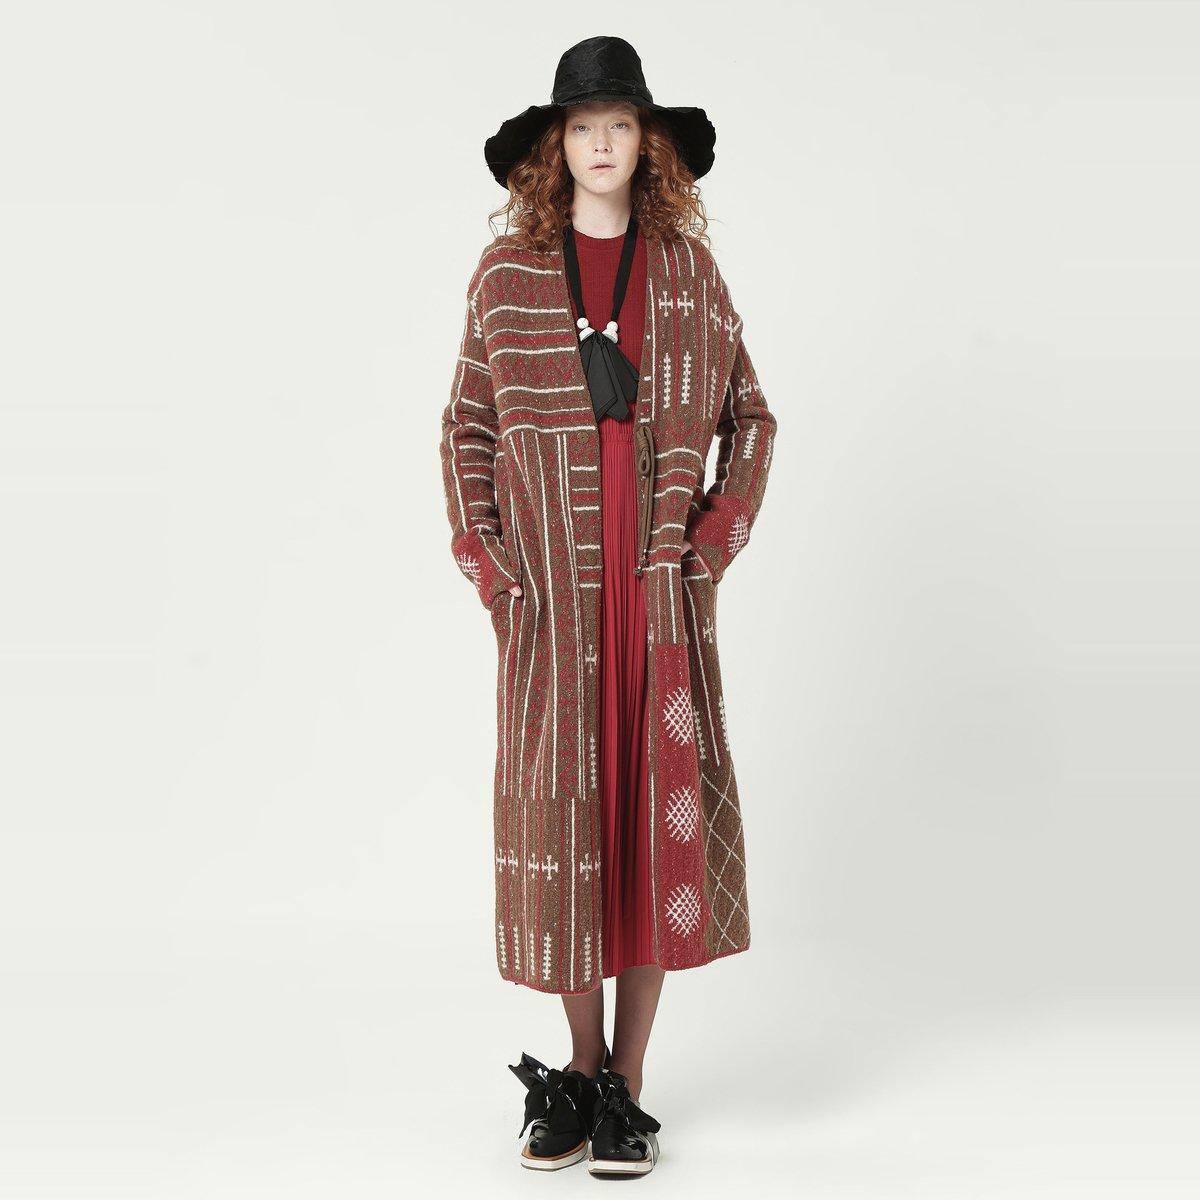 EINEIN言羊毛不对称名族风提花开衫外套EK1104941803